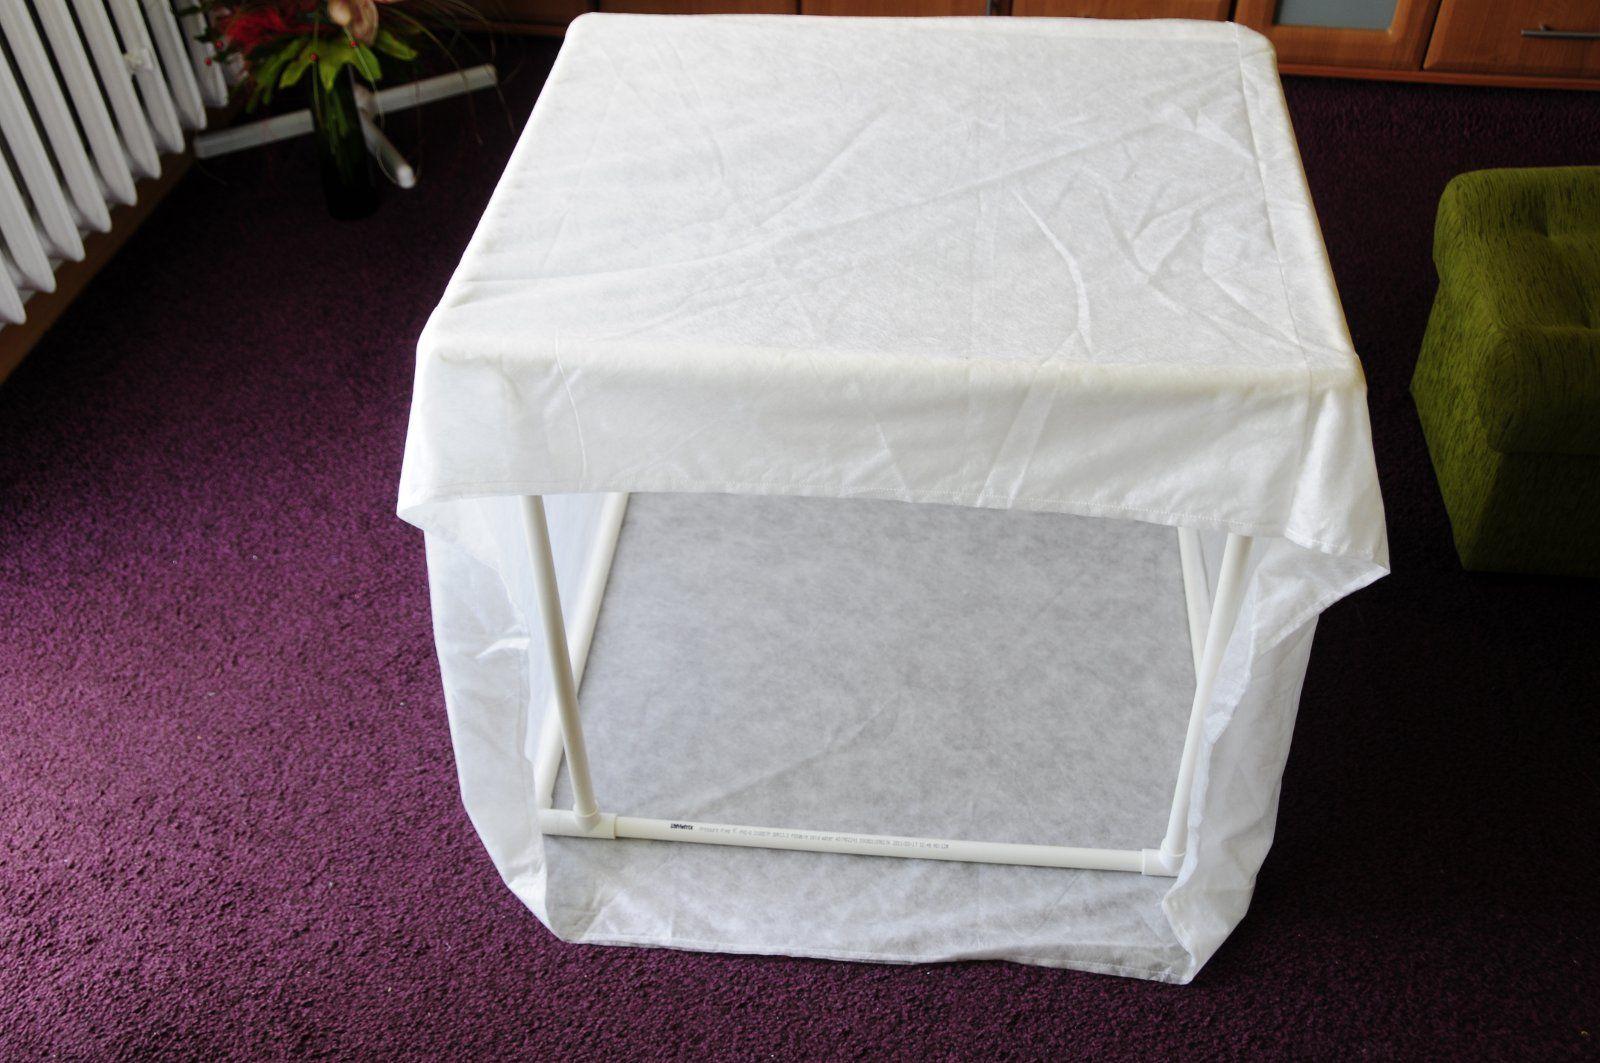 Namiot Bezcieniowy Zrob To Sam Viaxe Pl Podroze Informatyka Home Decor Decor Furniture